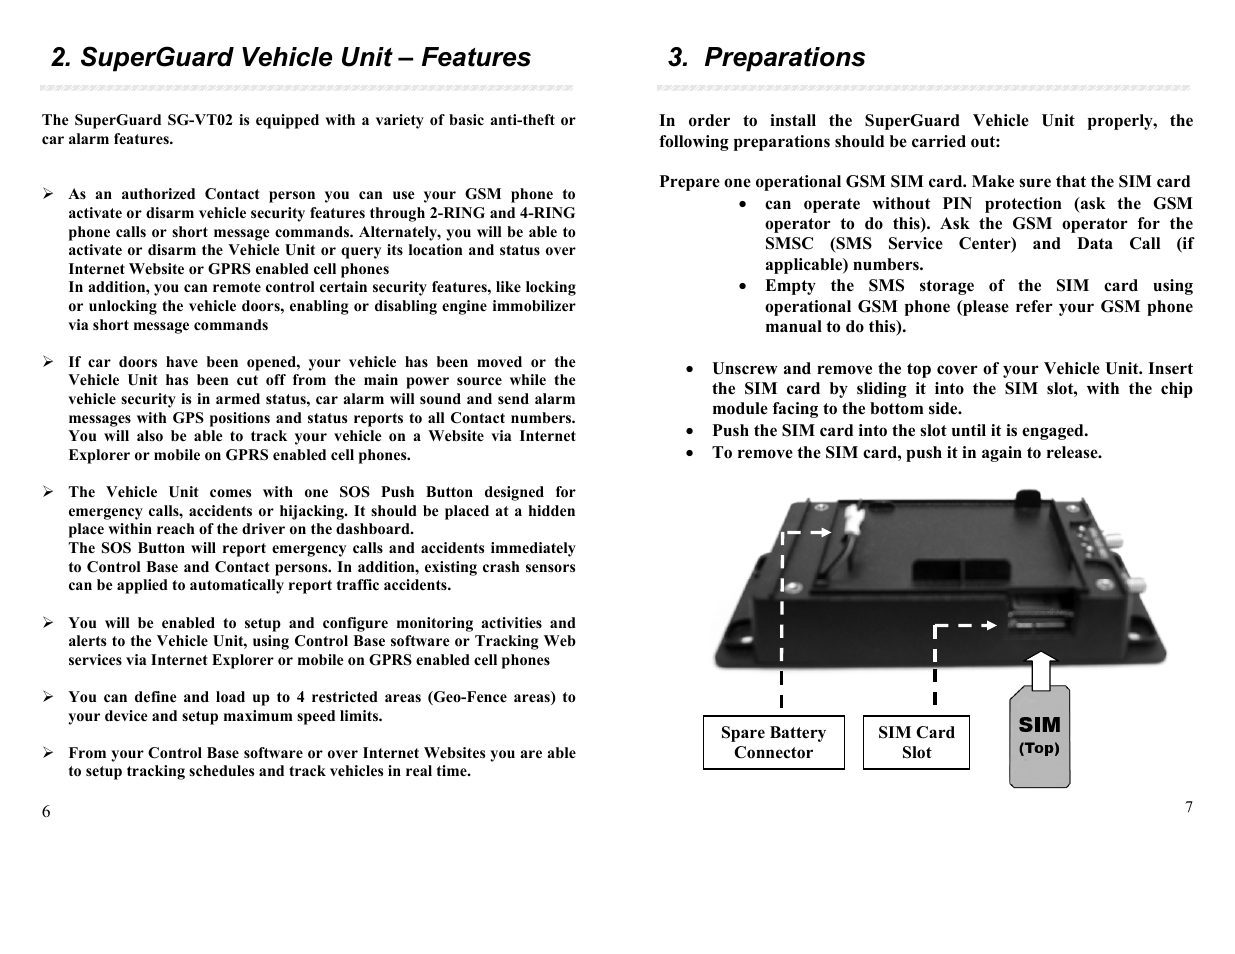 superguard vehicle unit features preparations apm sg vt02 qb rh manualsdir com apm user manual liebert apm user manual